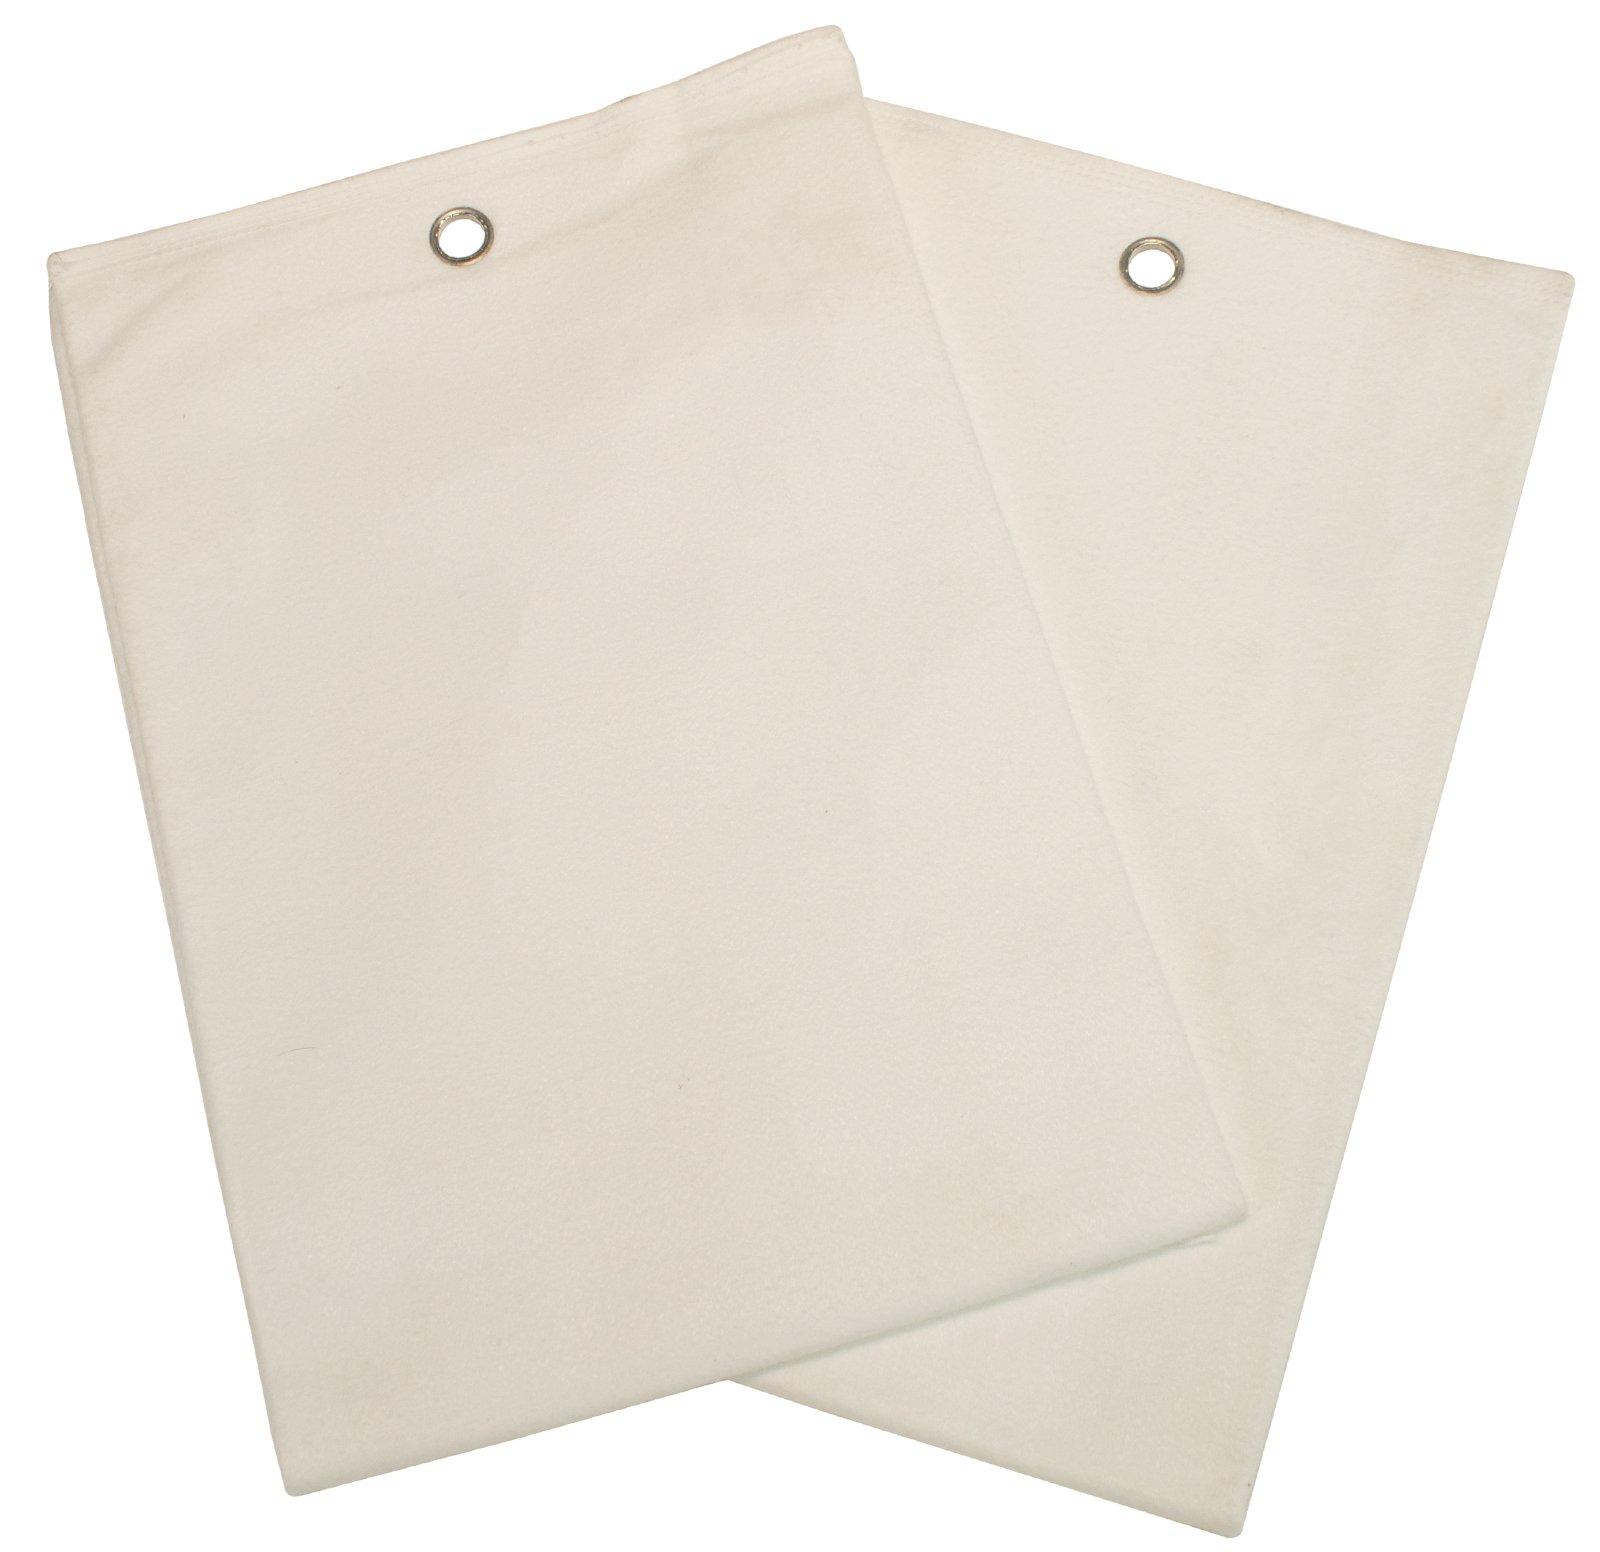 Dragway Tools (2) Filter Bags for Dual Dust Collector Sandblast Sandblasting Cabinet